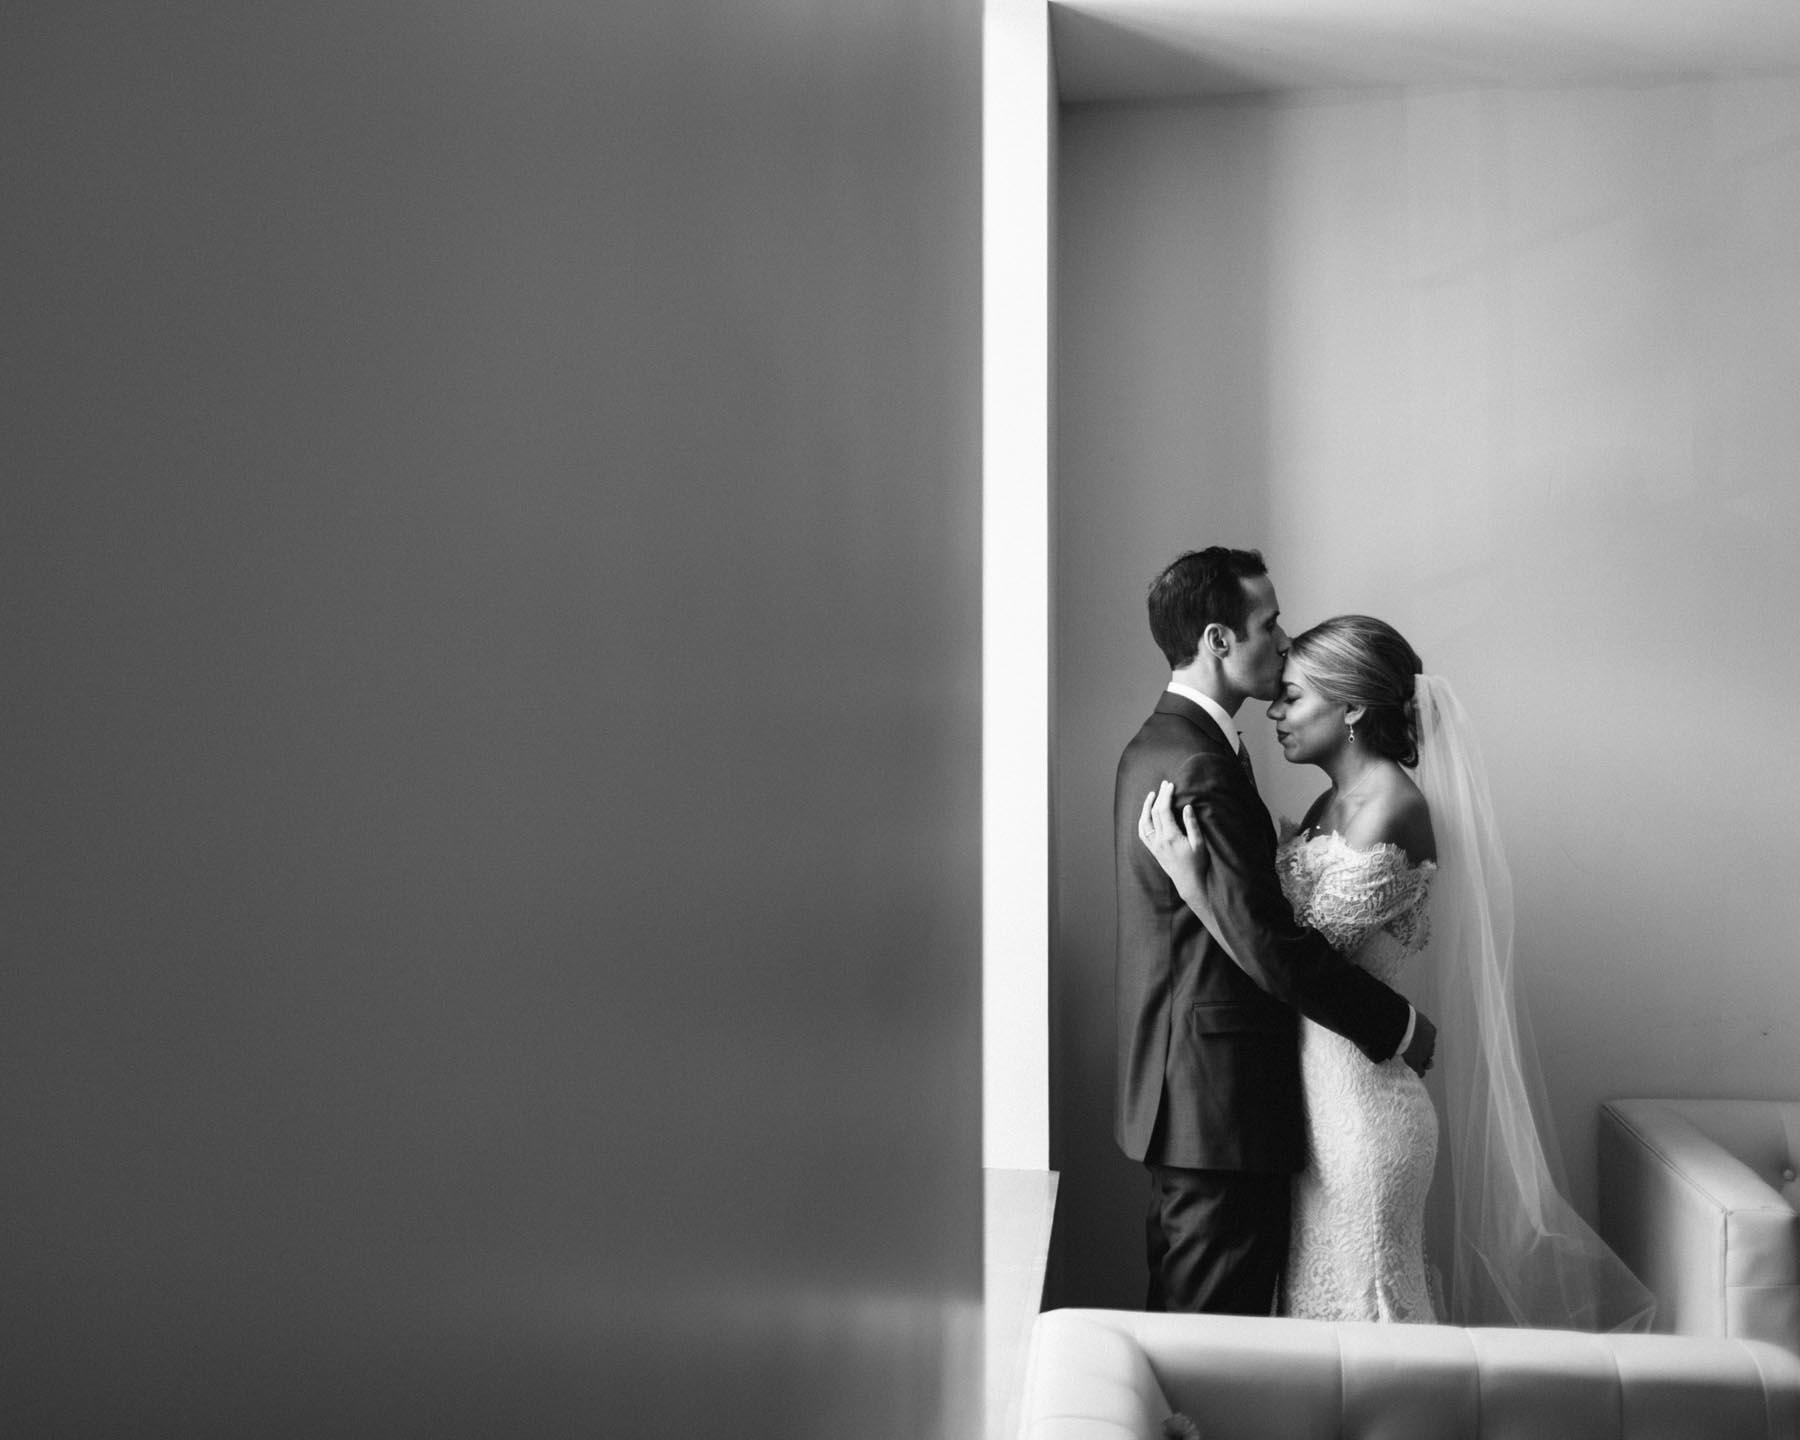 kjellman wedding blog biltmore wedding -40